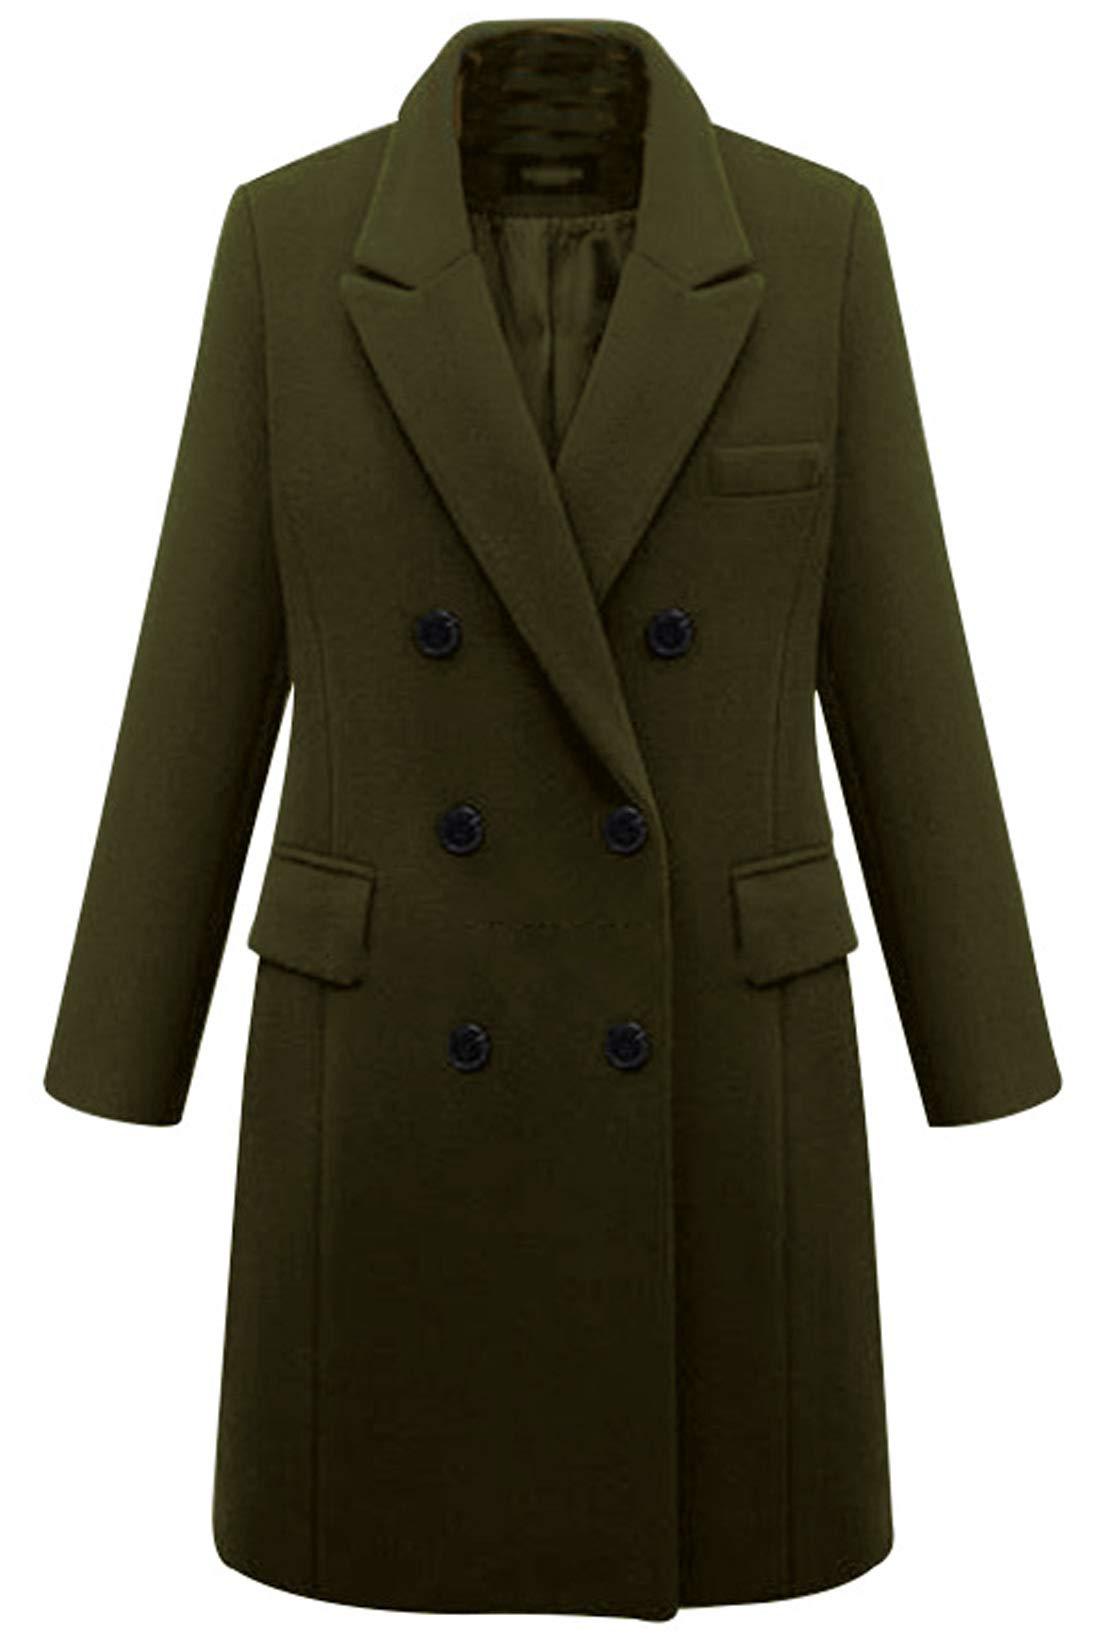 chouyatou Women's Basic Designed Notch Lapel Double Breasted Mid-Long Wool Pea Coat